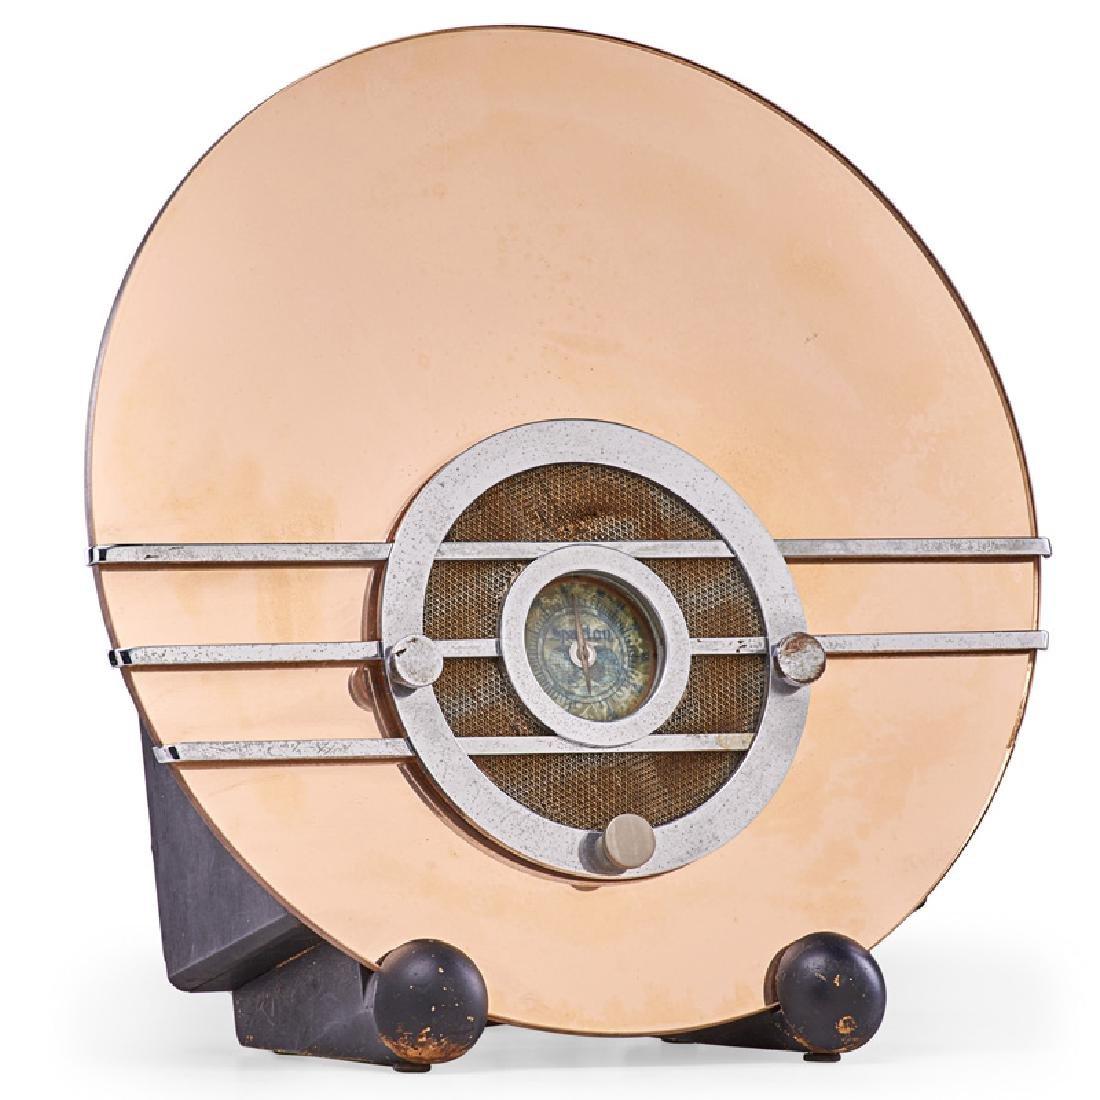 WALTER DORWIN TEAGUE Peachbird radio